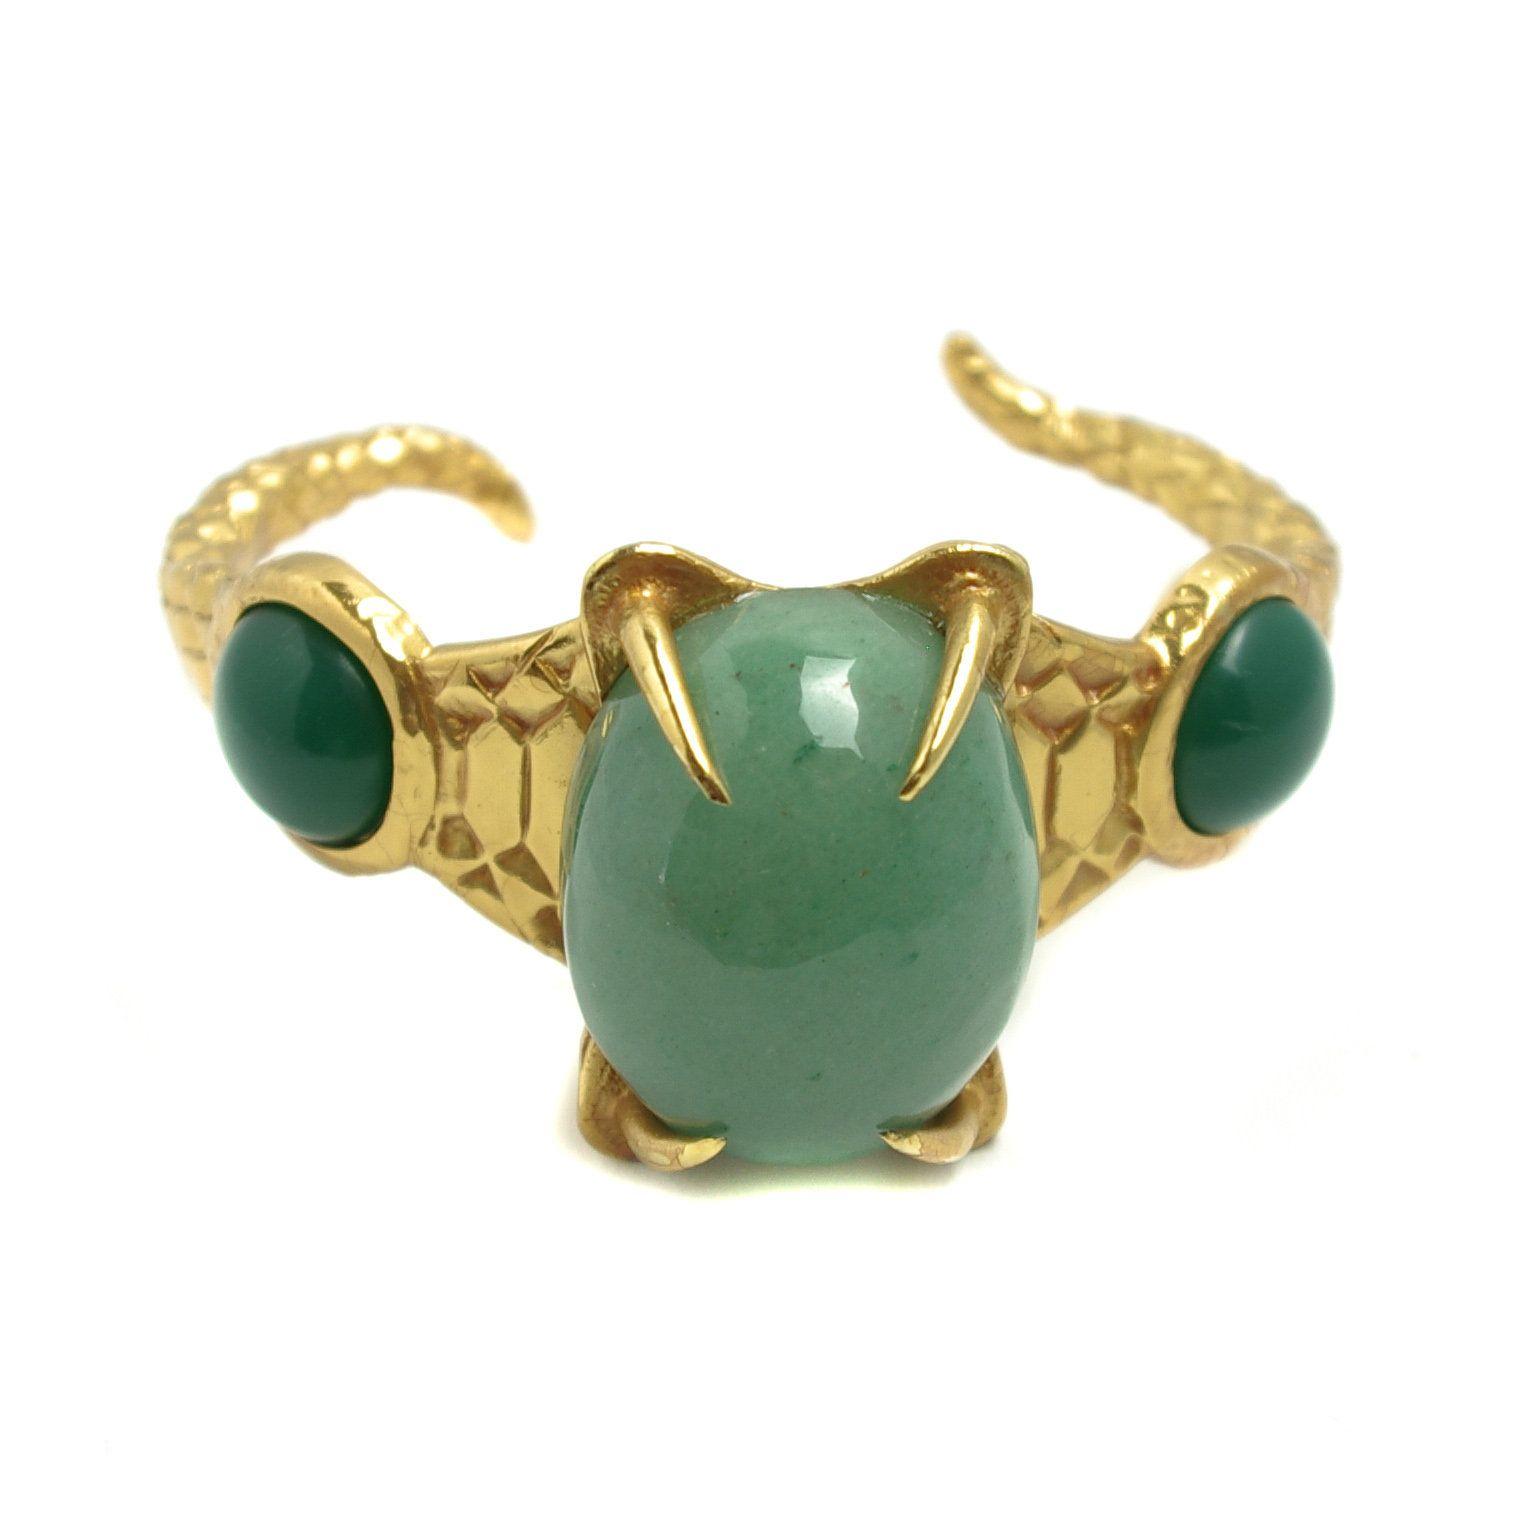 8cdbad35d96 Vintage YVES SAINT LAURENT Green Aventurine Quartz, Chyrsoprase and Gold  Plate Heavy Snake Fang Cuff Bracelet by TheGemmary on Etsy